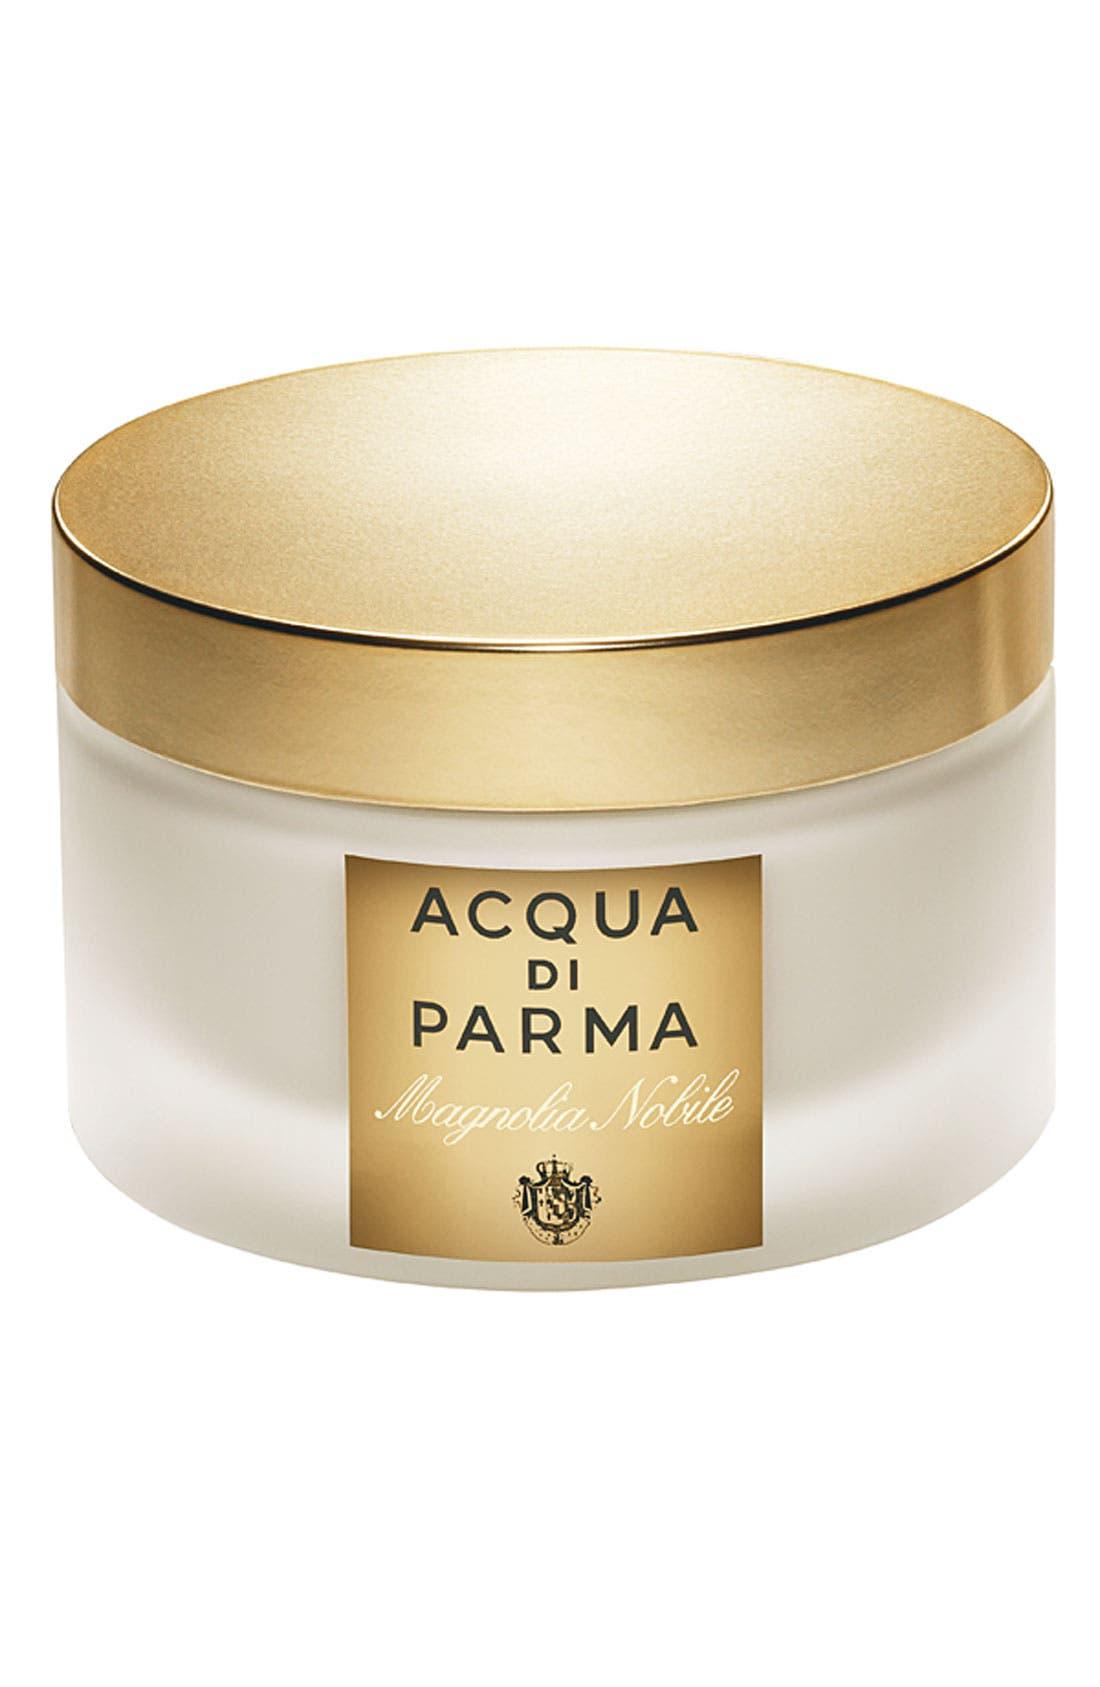 'Magnolia Nobile' Body Cream,                             Main thumbnail 1, color,                             000